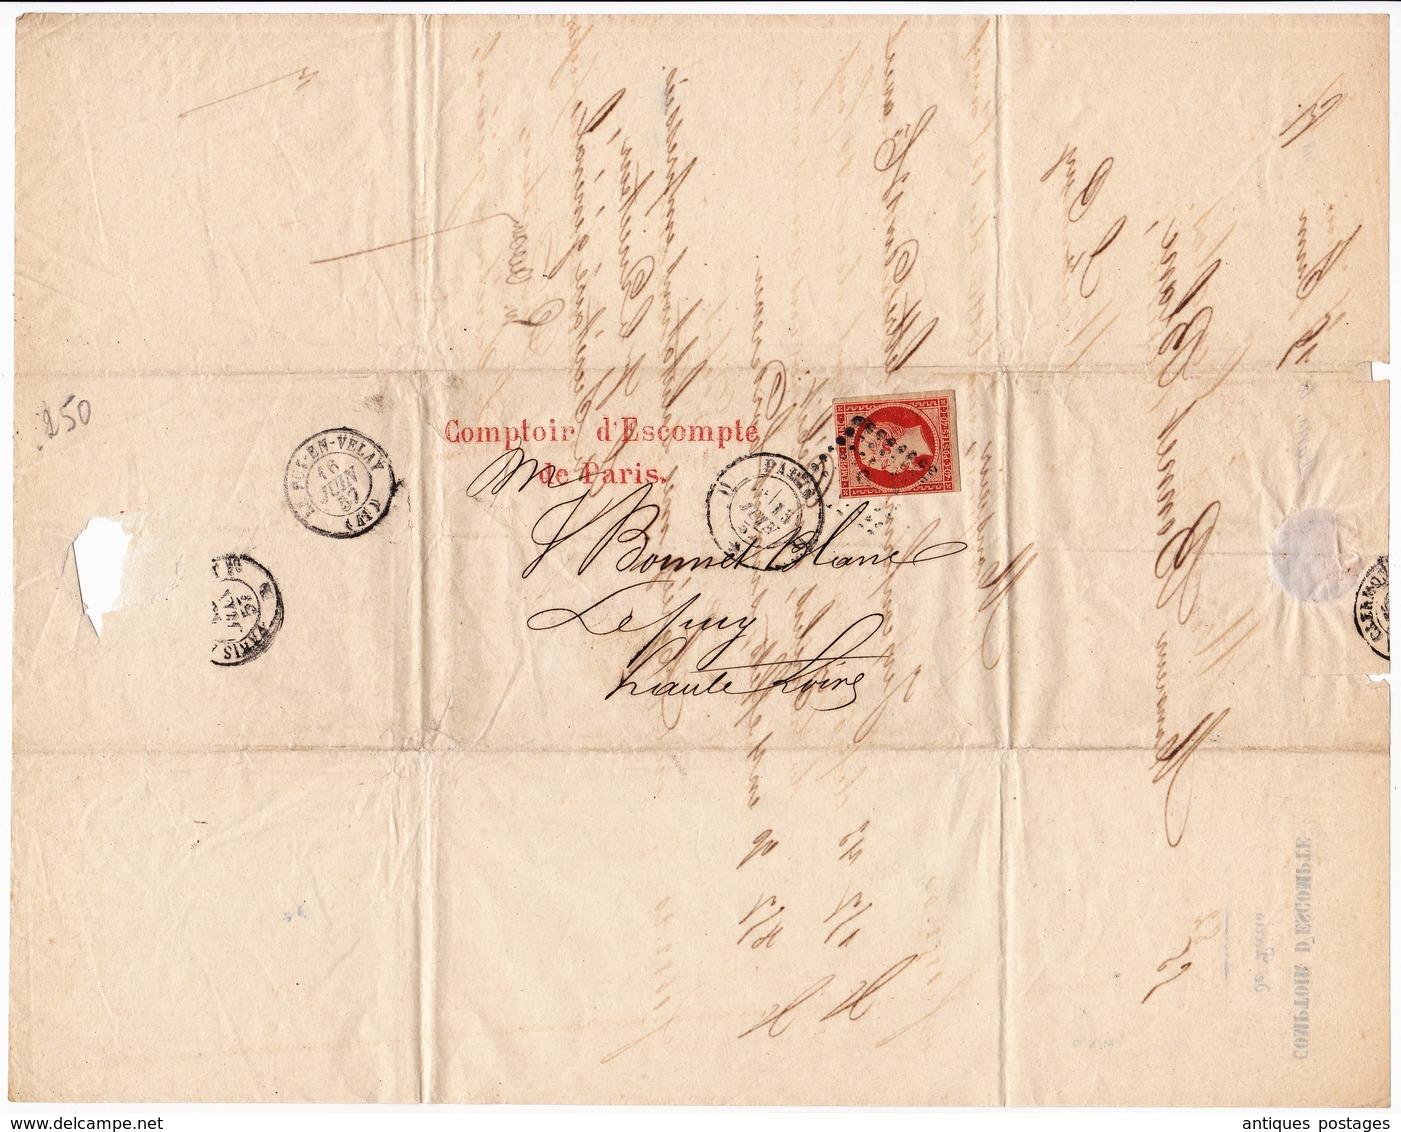 Lettre 1857 Paris Comptoir De L'Escompte Le Puy En Velay Timbre Napoléon III 40 Centimes - 1853-1860 Napoleon III